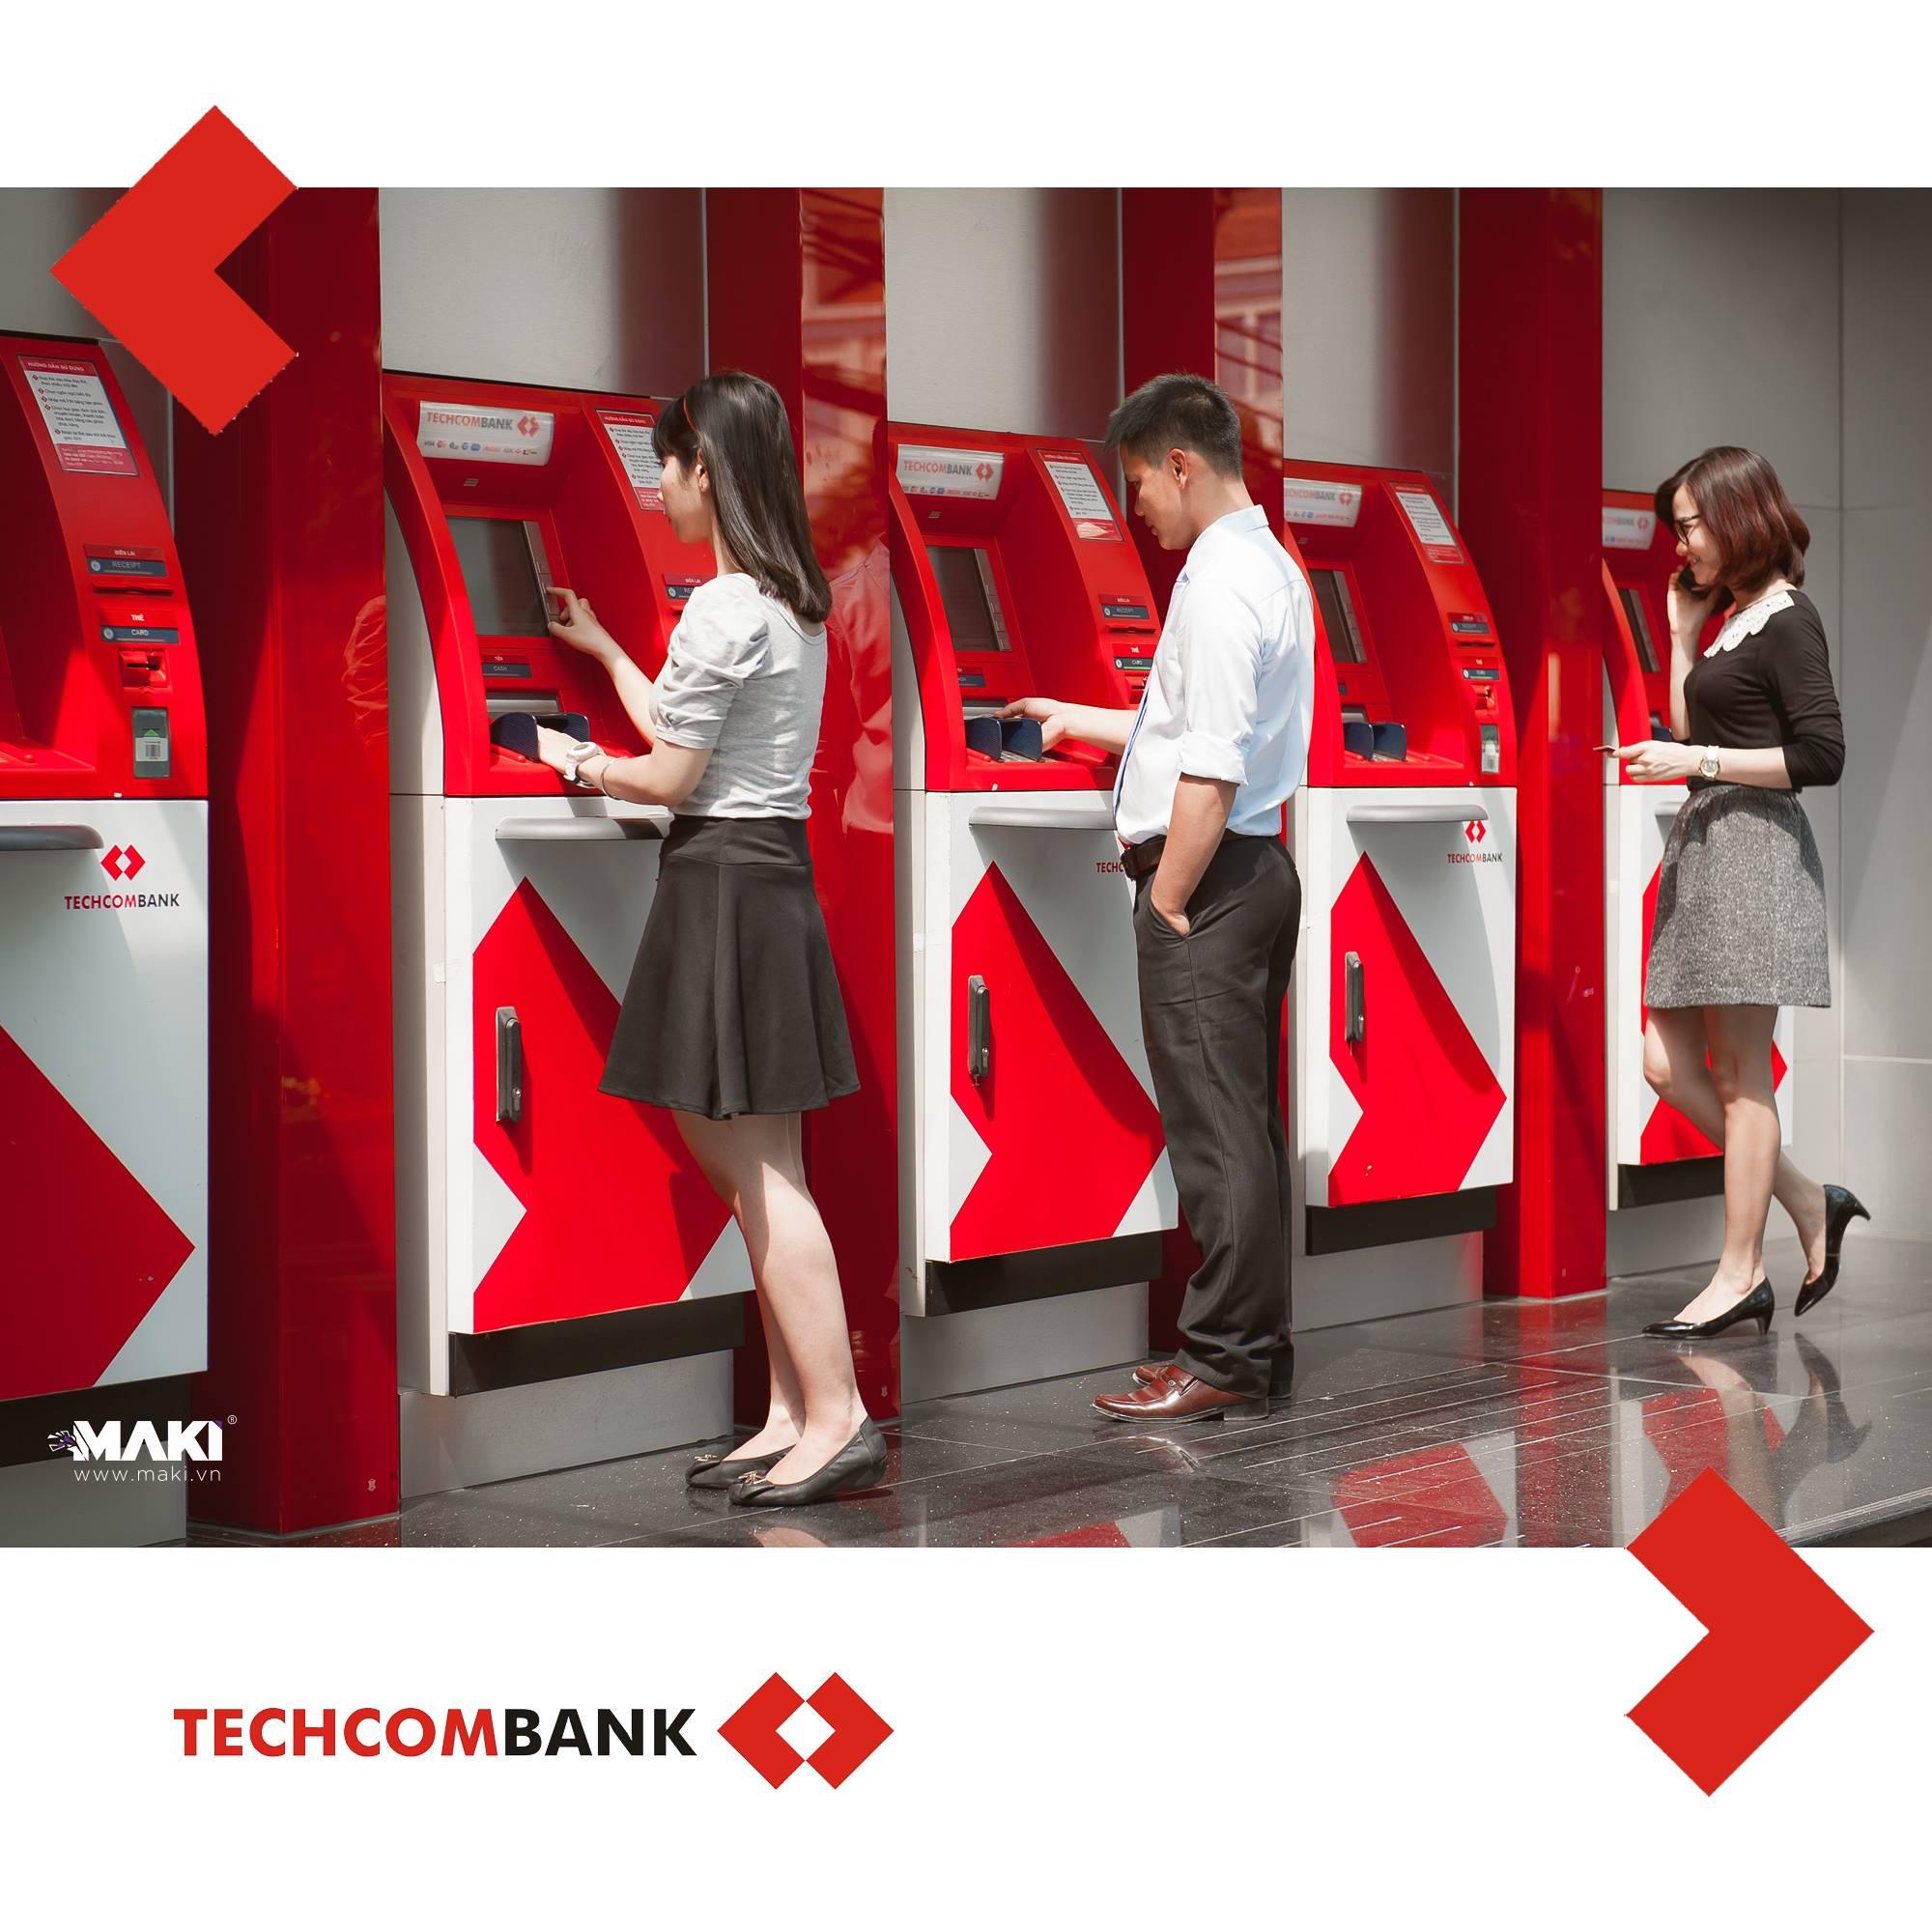 chup-anh-quang-cao-techcombank-3.jpg